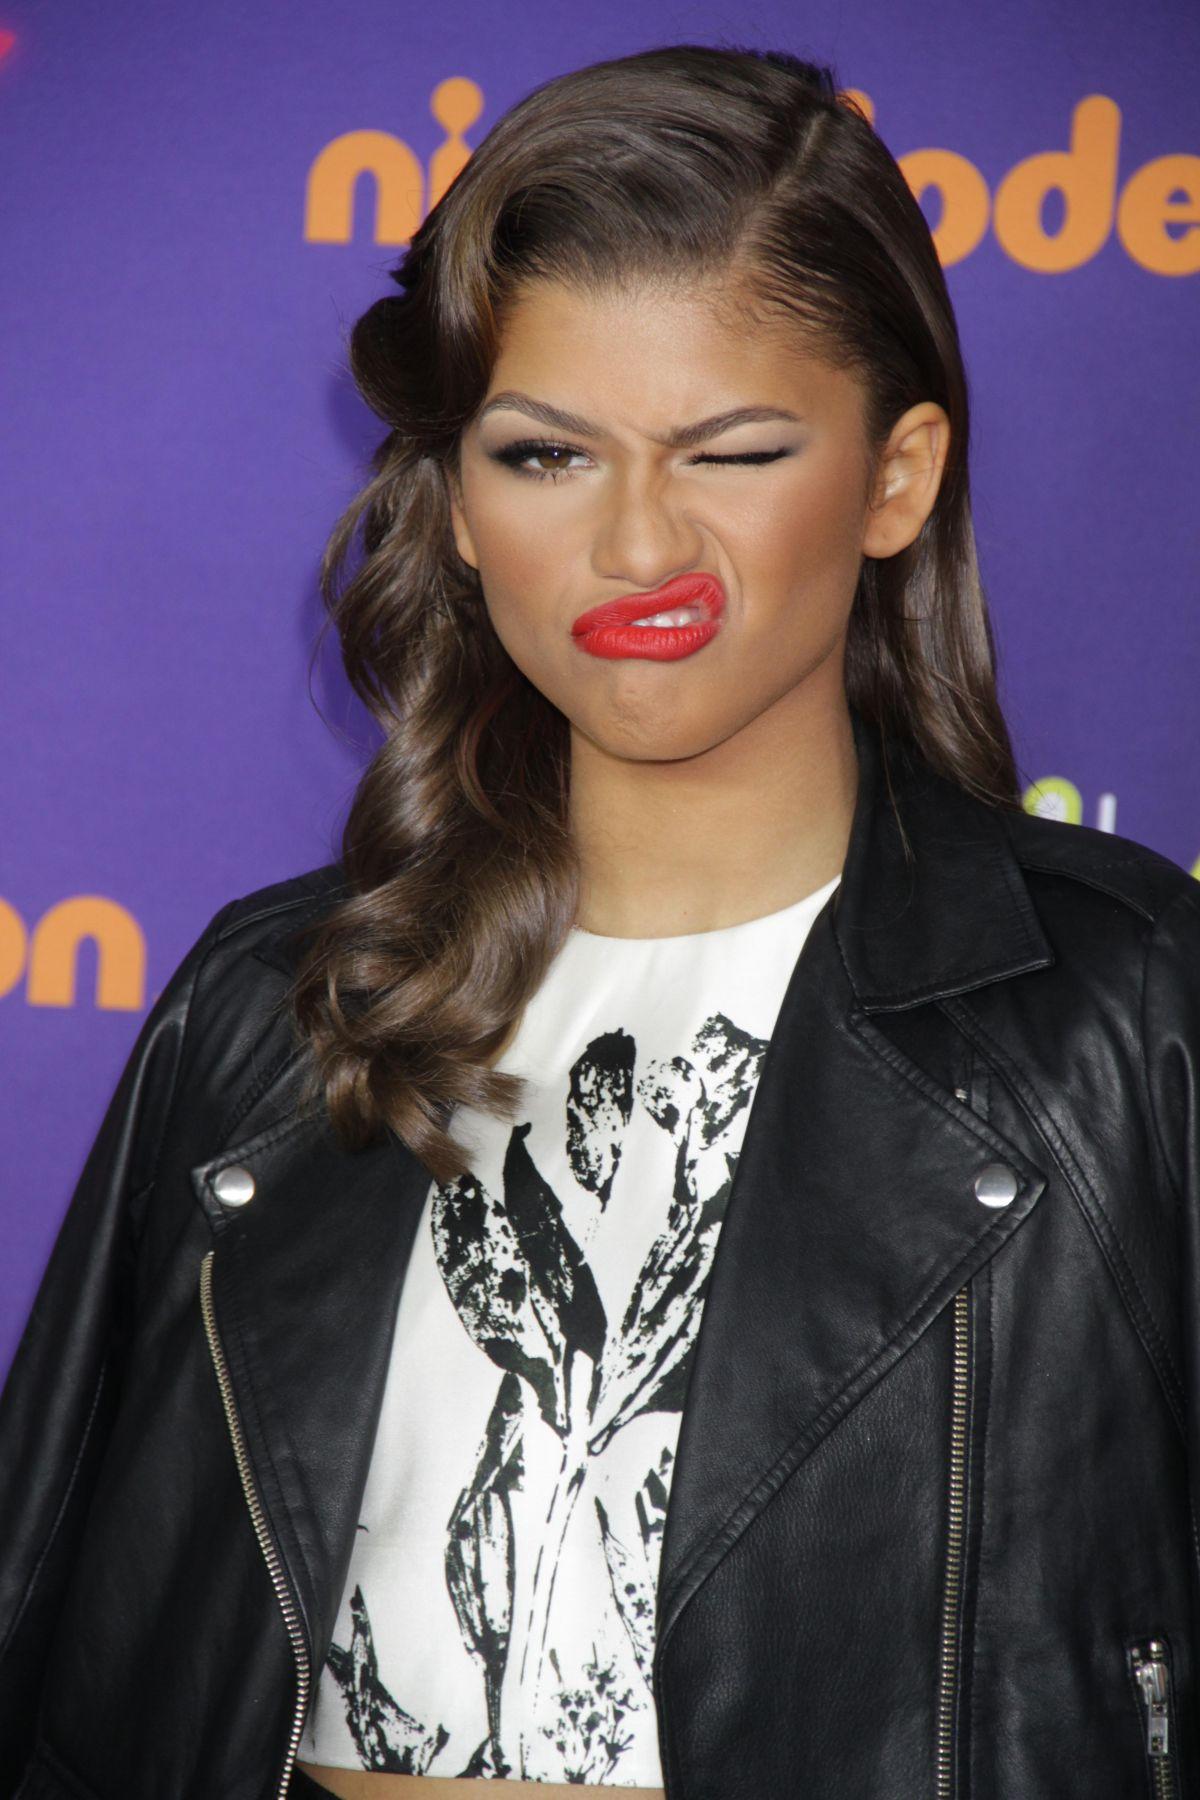 ZENDAYA COLEMAN at Nickelodeon Halo Awards 2014 in New York